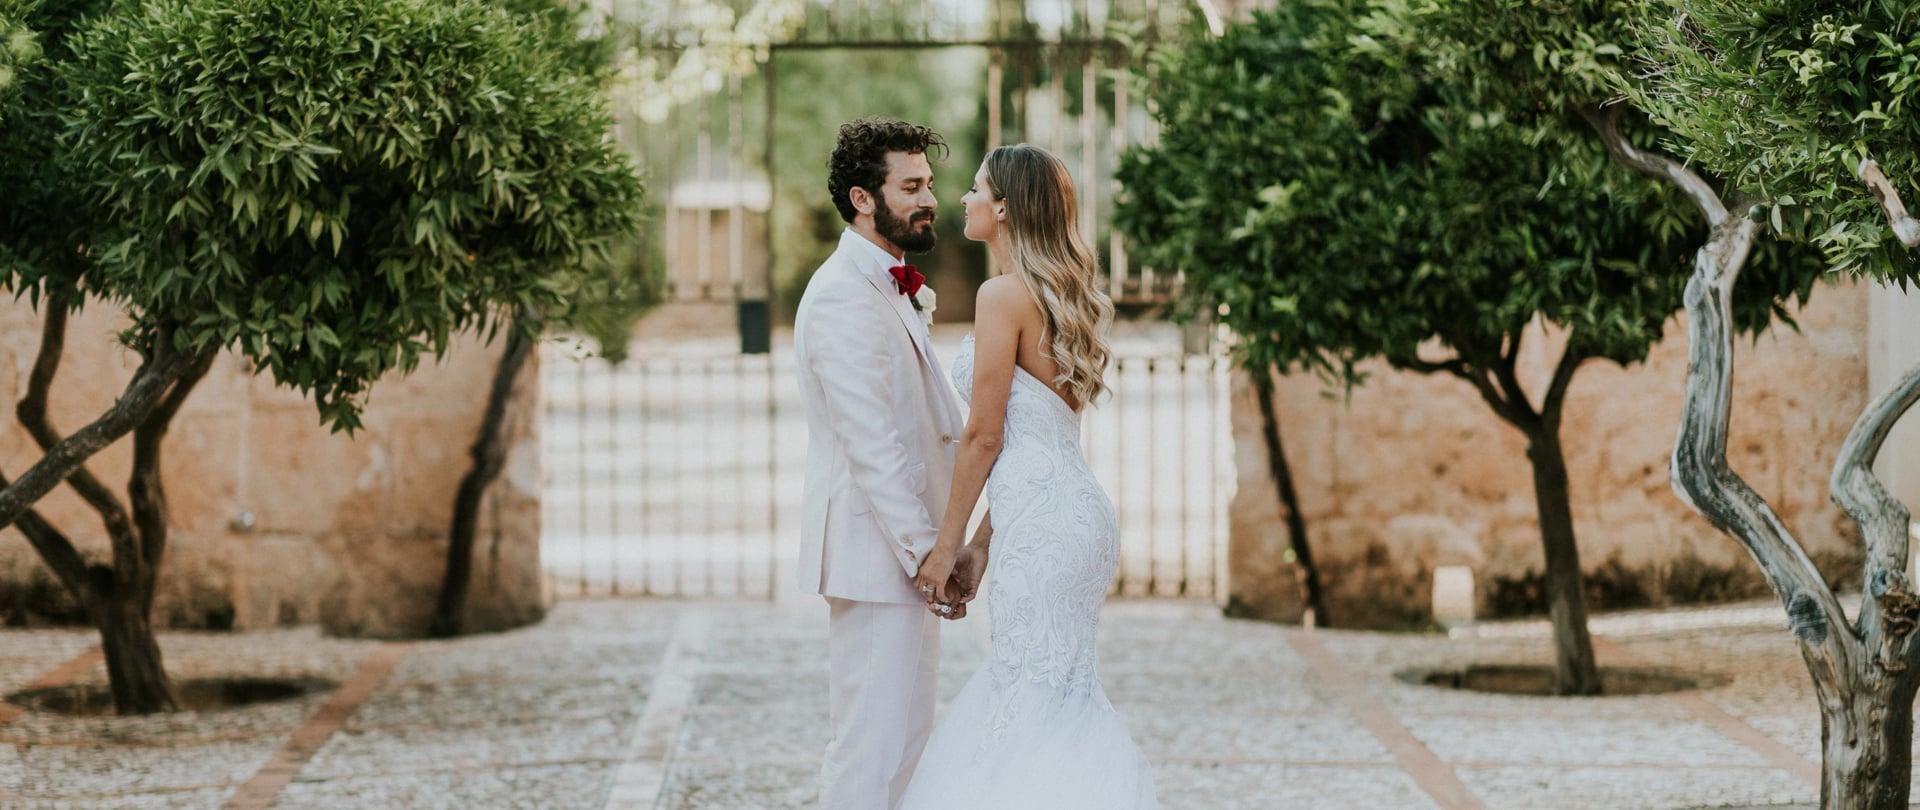 Grace & James Wedding Video Filmed at Mallorca, Spain